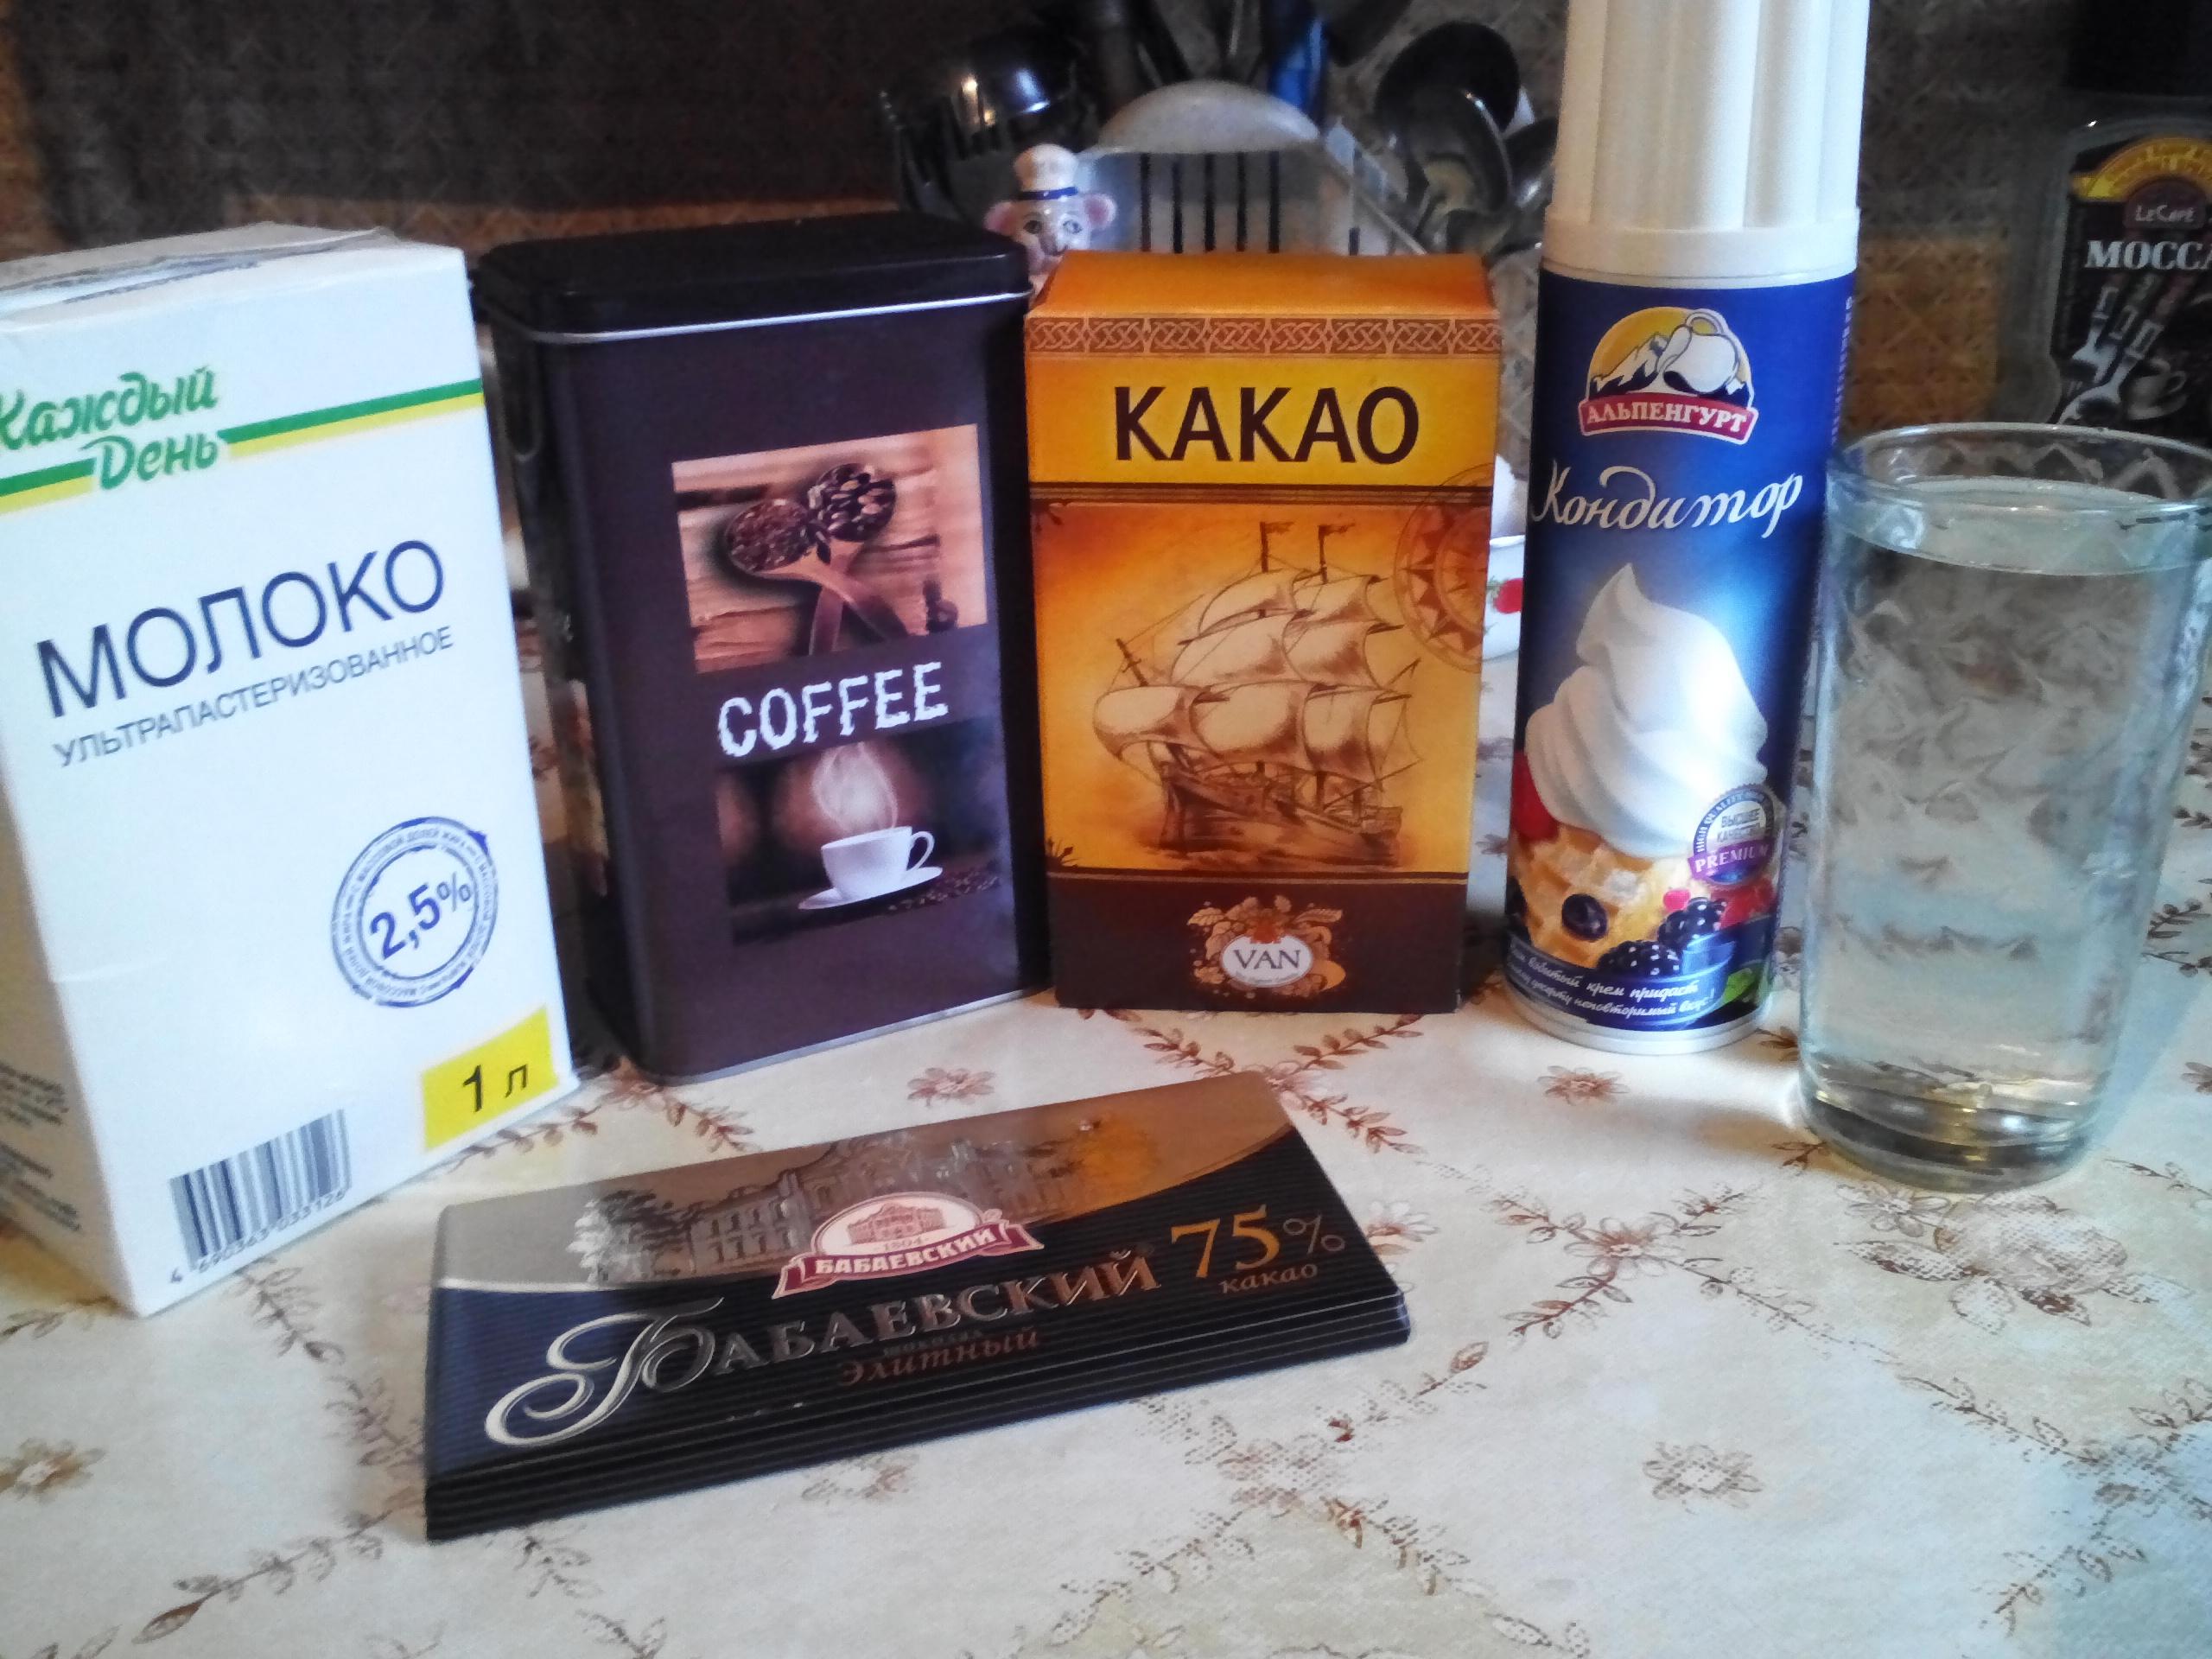 Кофе с горьким шоколадом